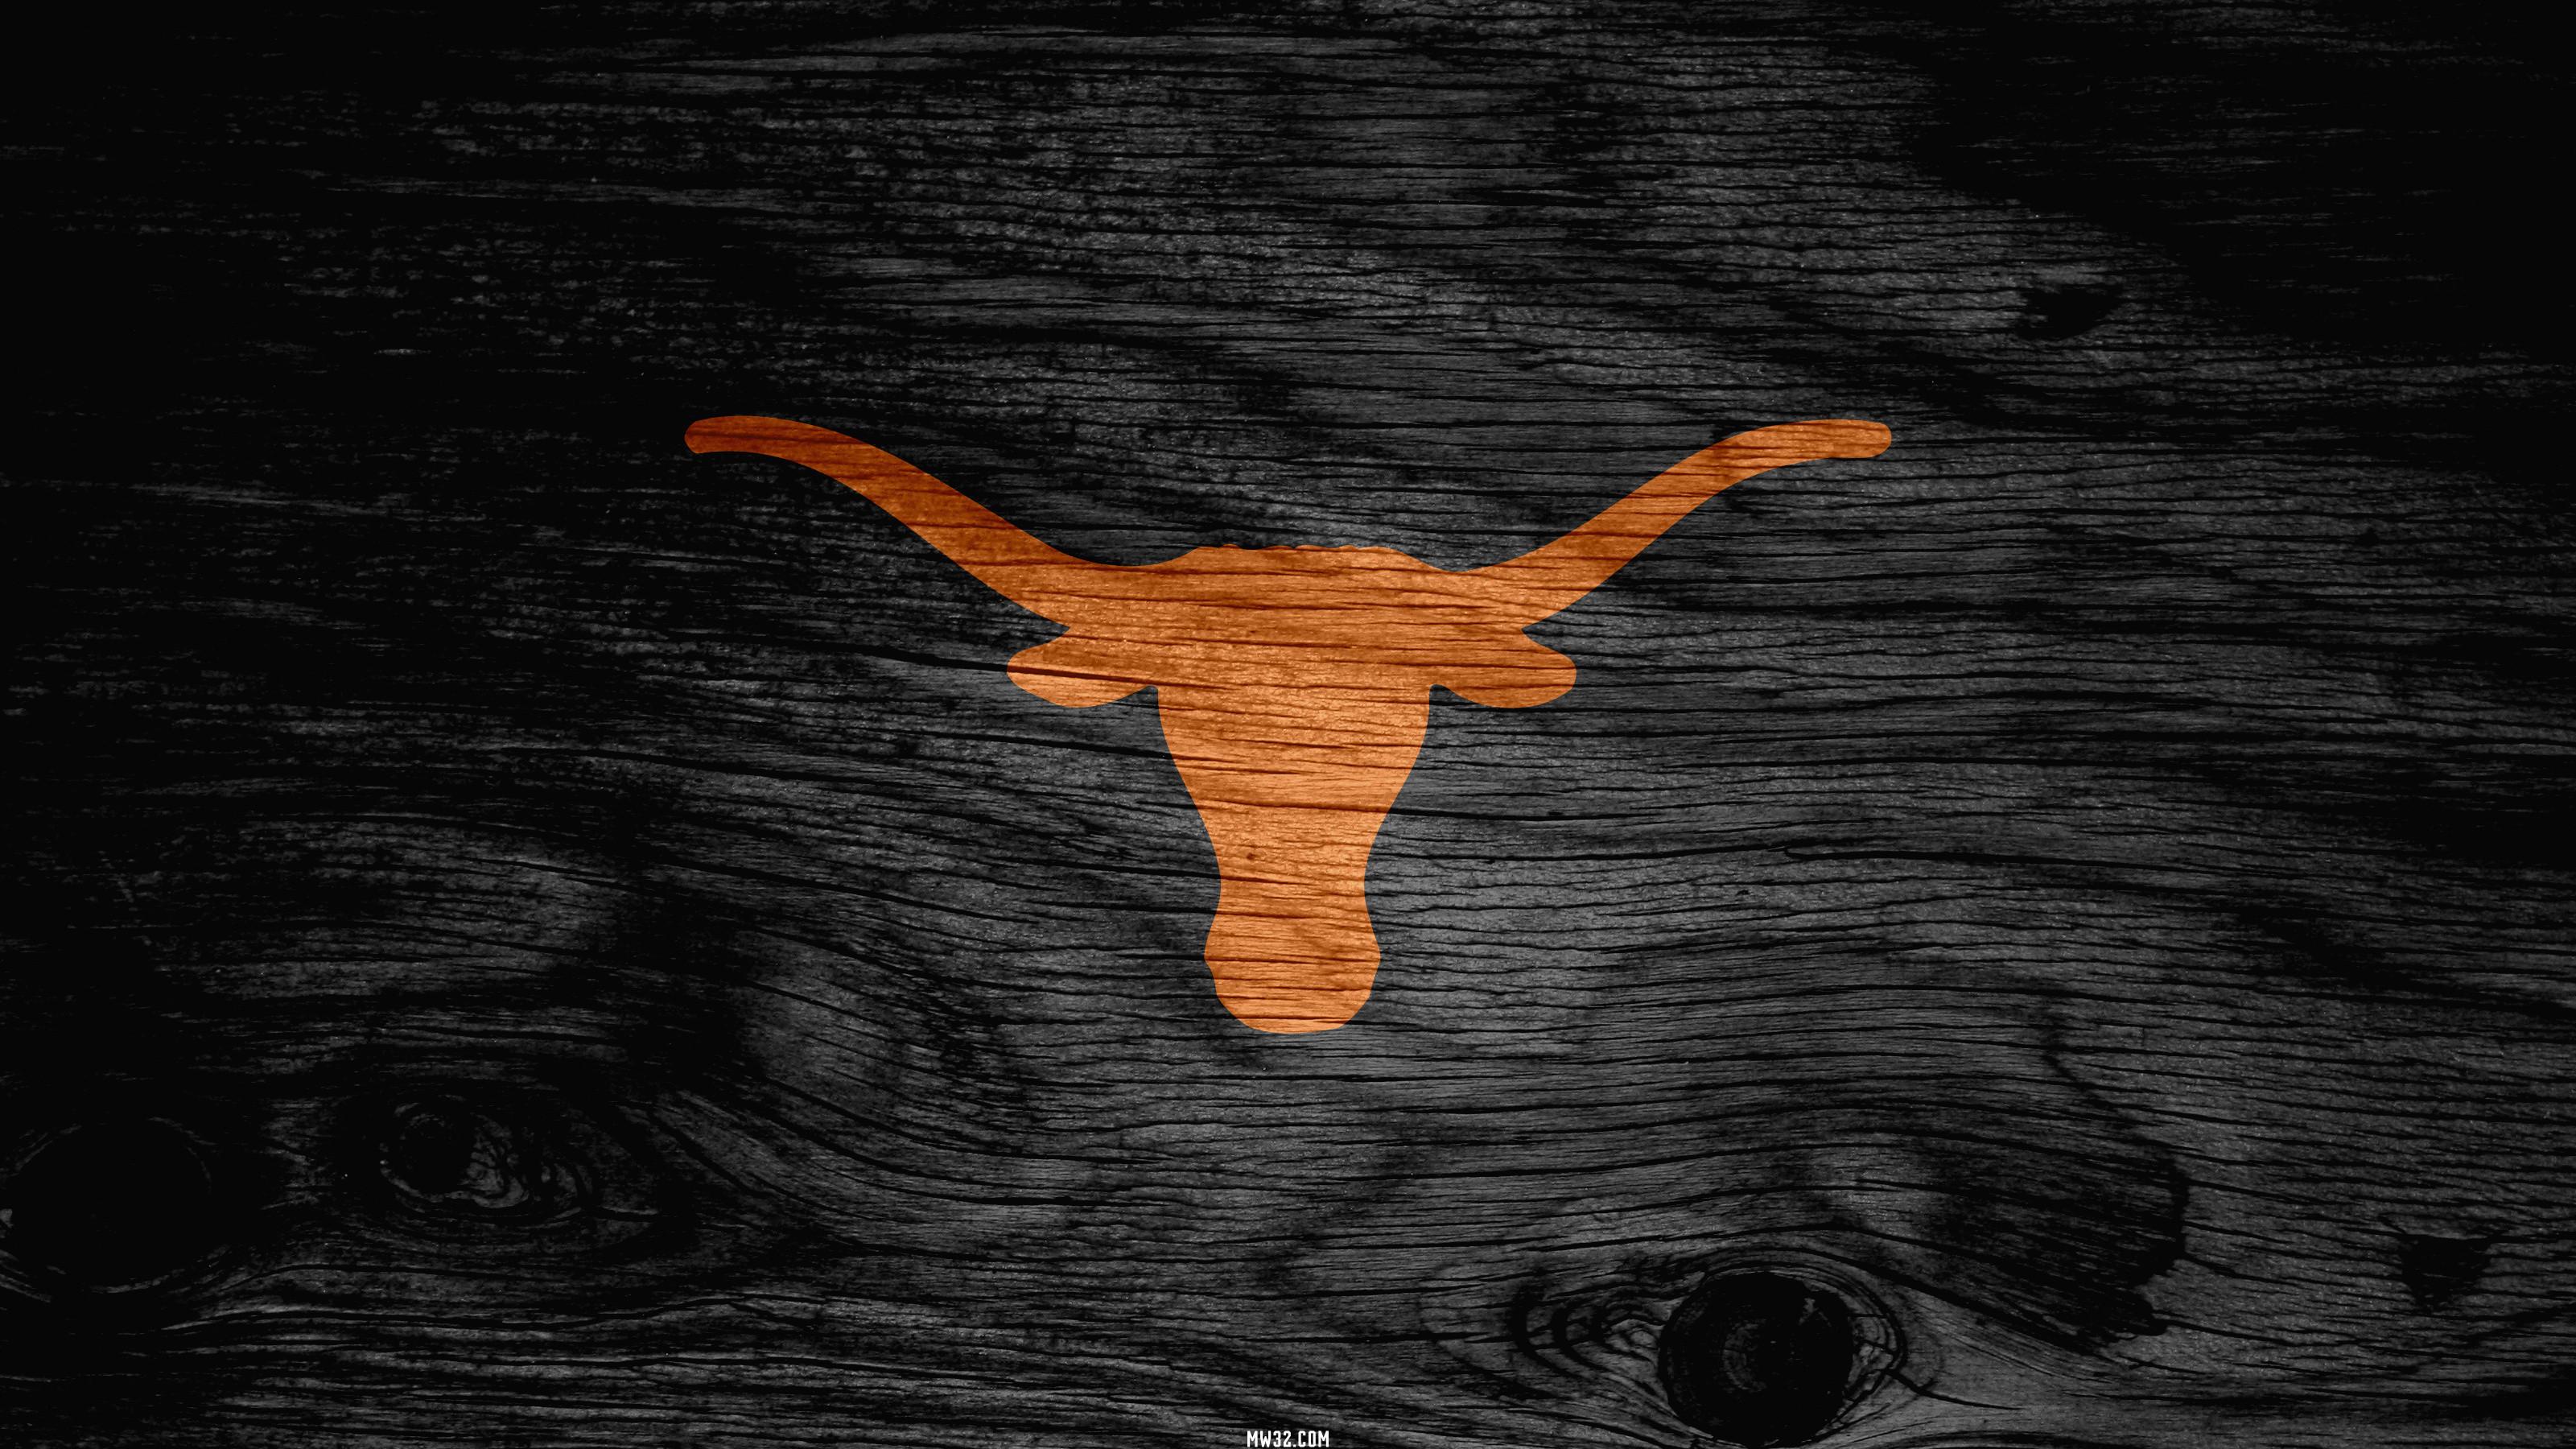 texas longhorns desktop wallpaper texas longhorns football texas .